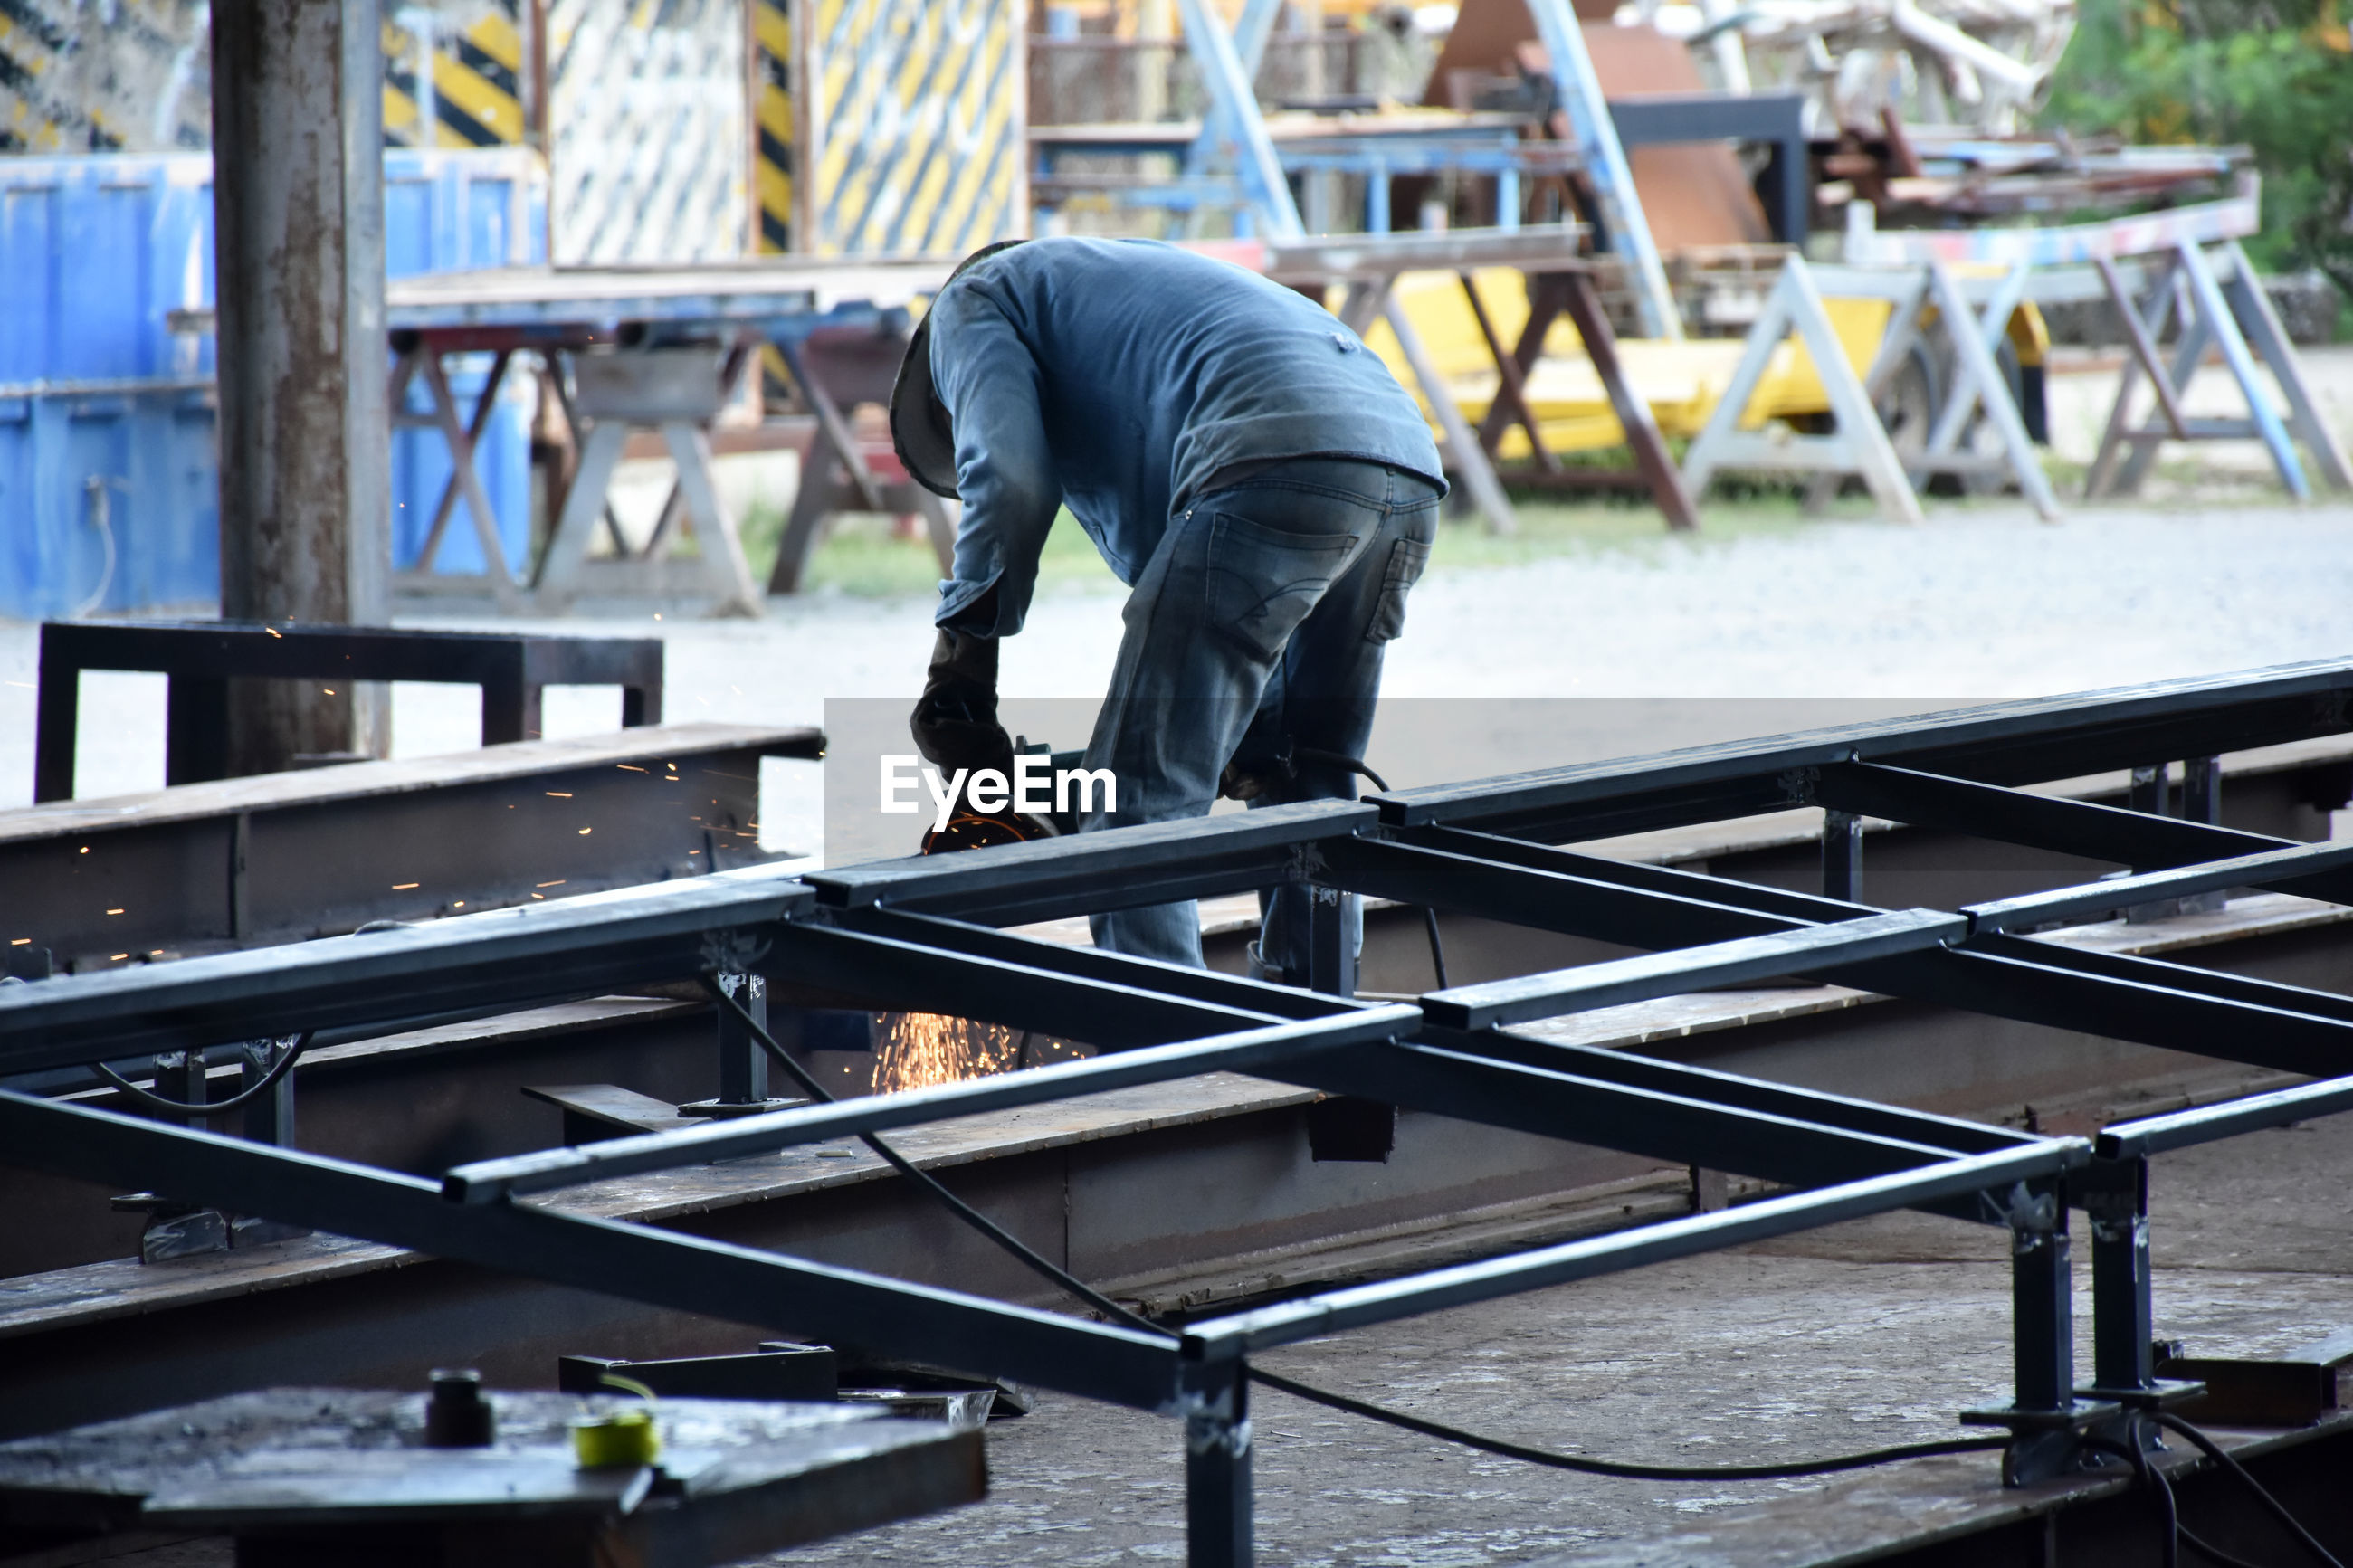 FULL LENGTH OF MAN WORKING ON METAL RAILING